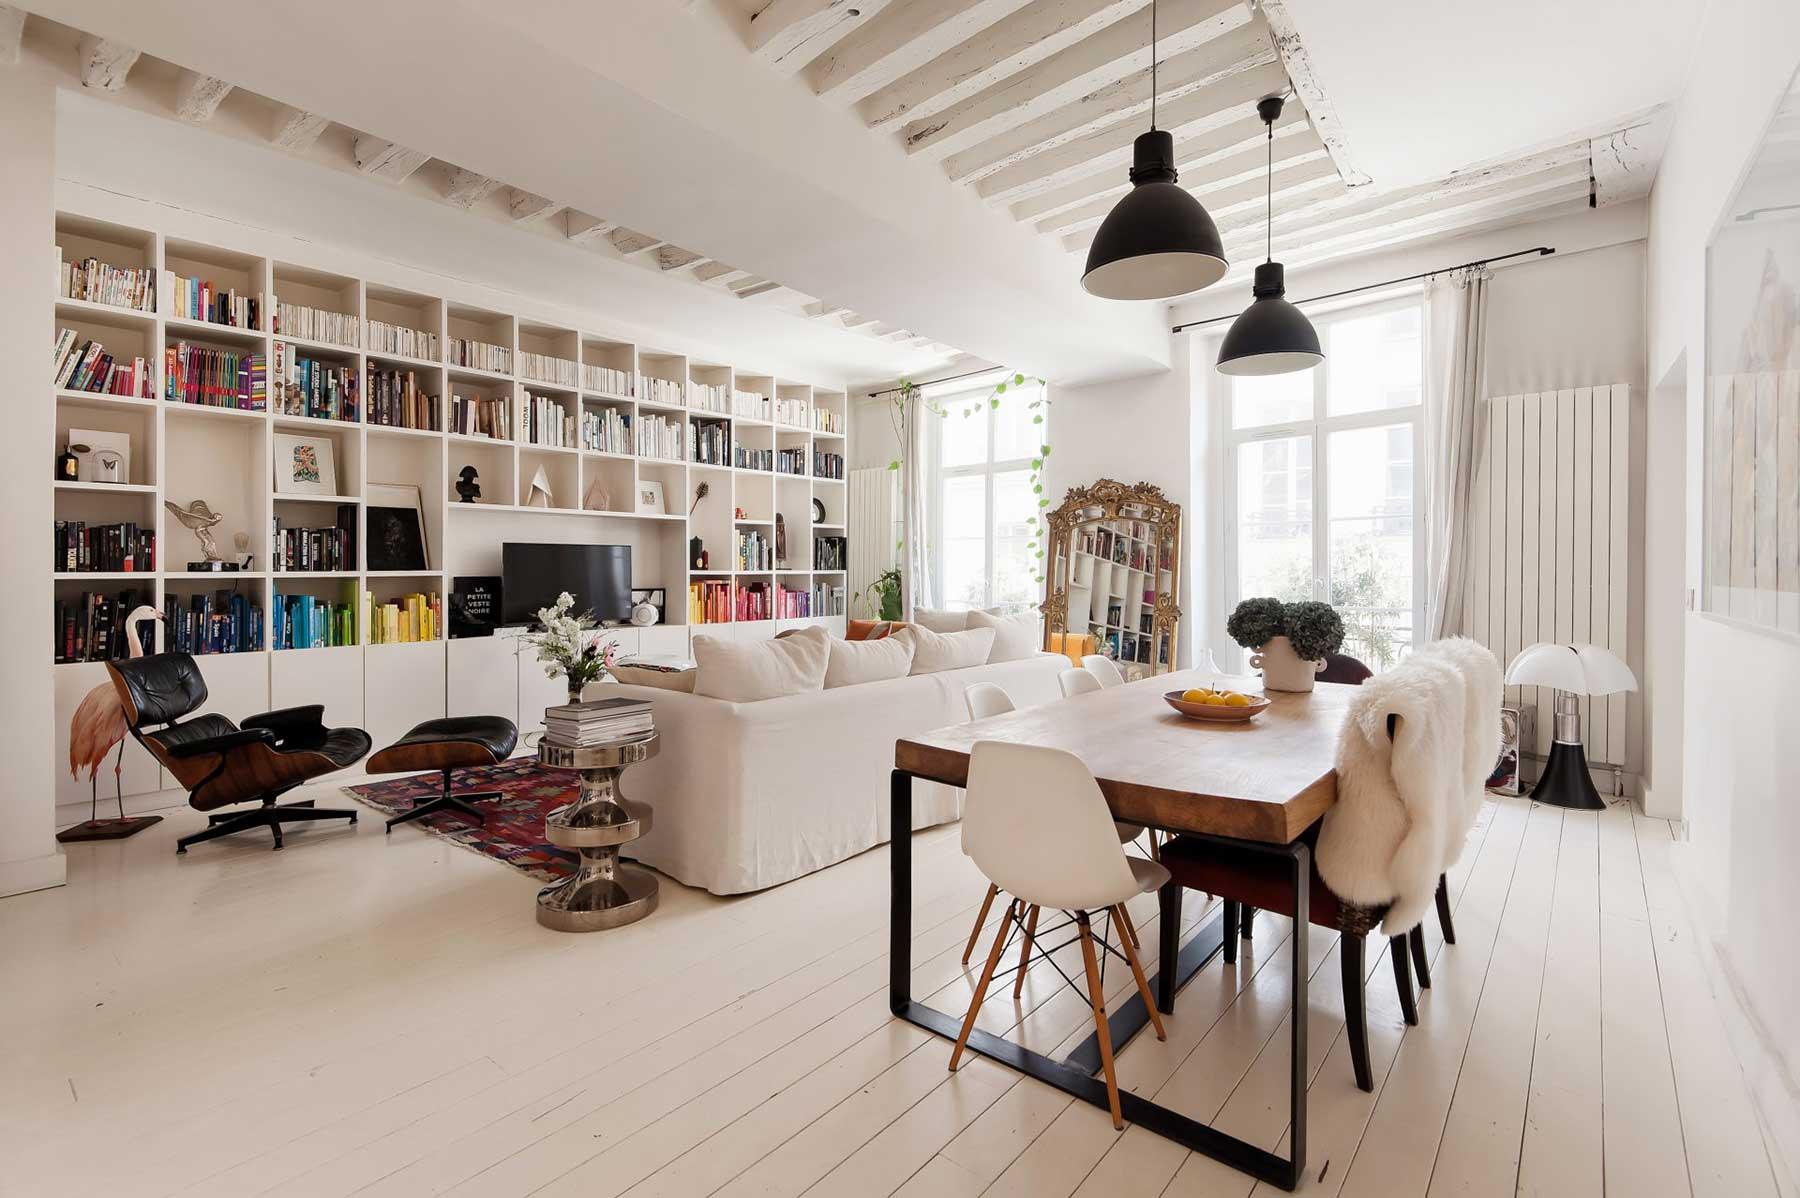 Paris 75003 - France - Apartment , 3 rooms, 1 bedroom - Slideshow Picture 1